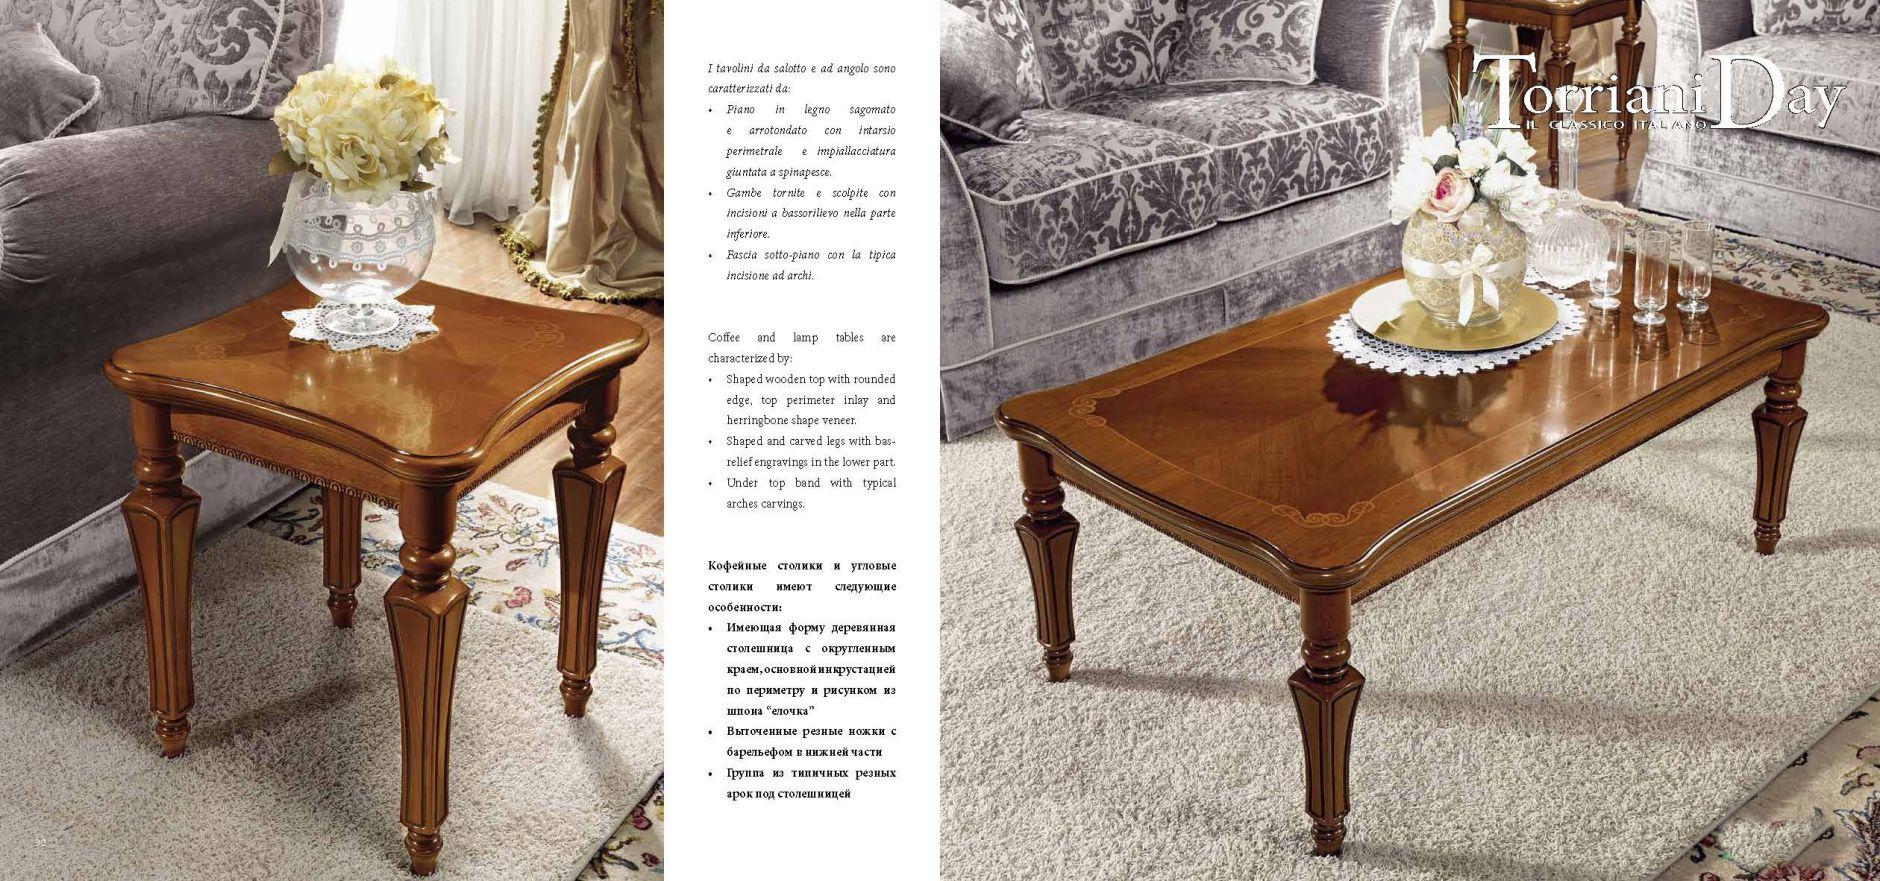 klassische m bel wohnzimmer m bel camelgroup serie tag torriani komposition 6die m bel aus italien. Black Bedroom Furniture Sets. Home Design Ideas